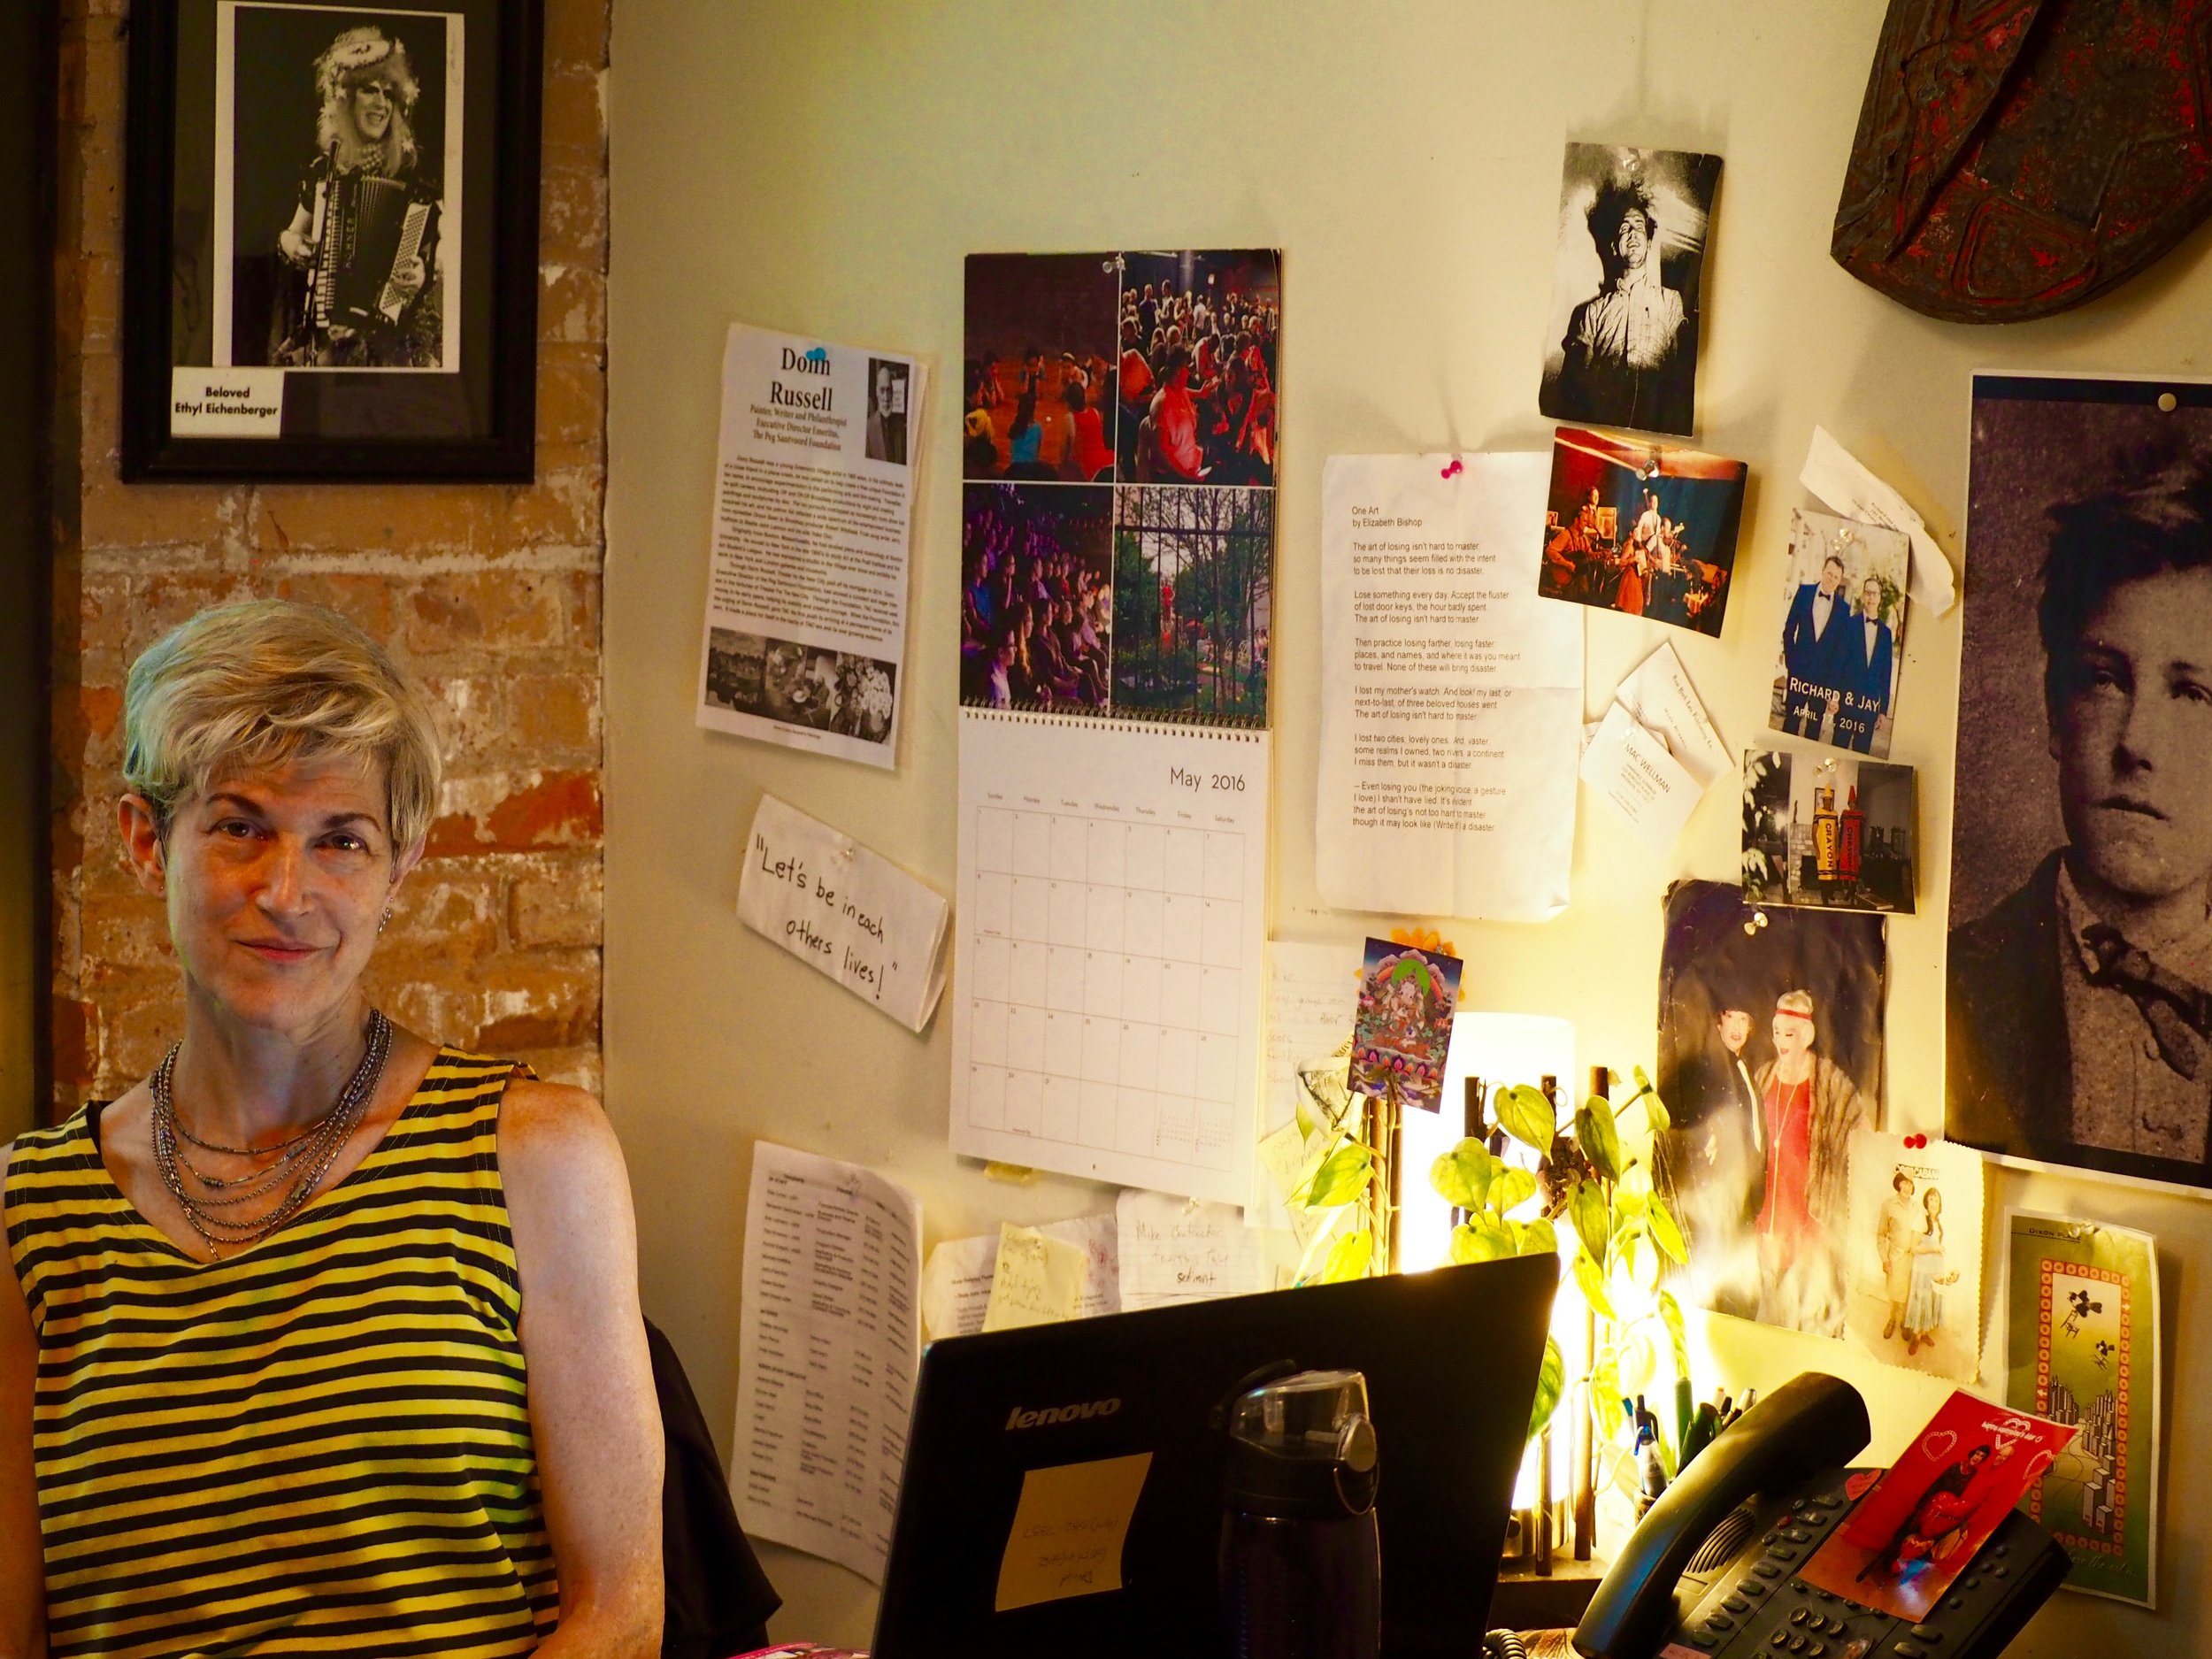 Ellie Covan in her domain, Dixon Place. Photograph: Adrian Brune